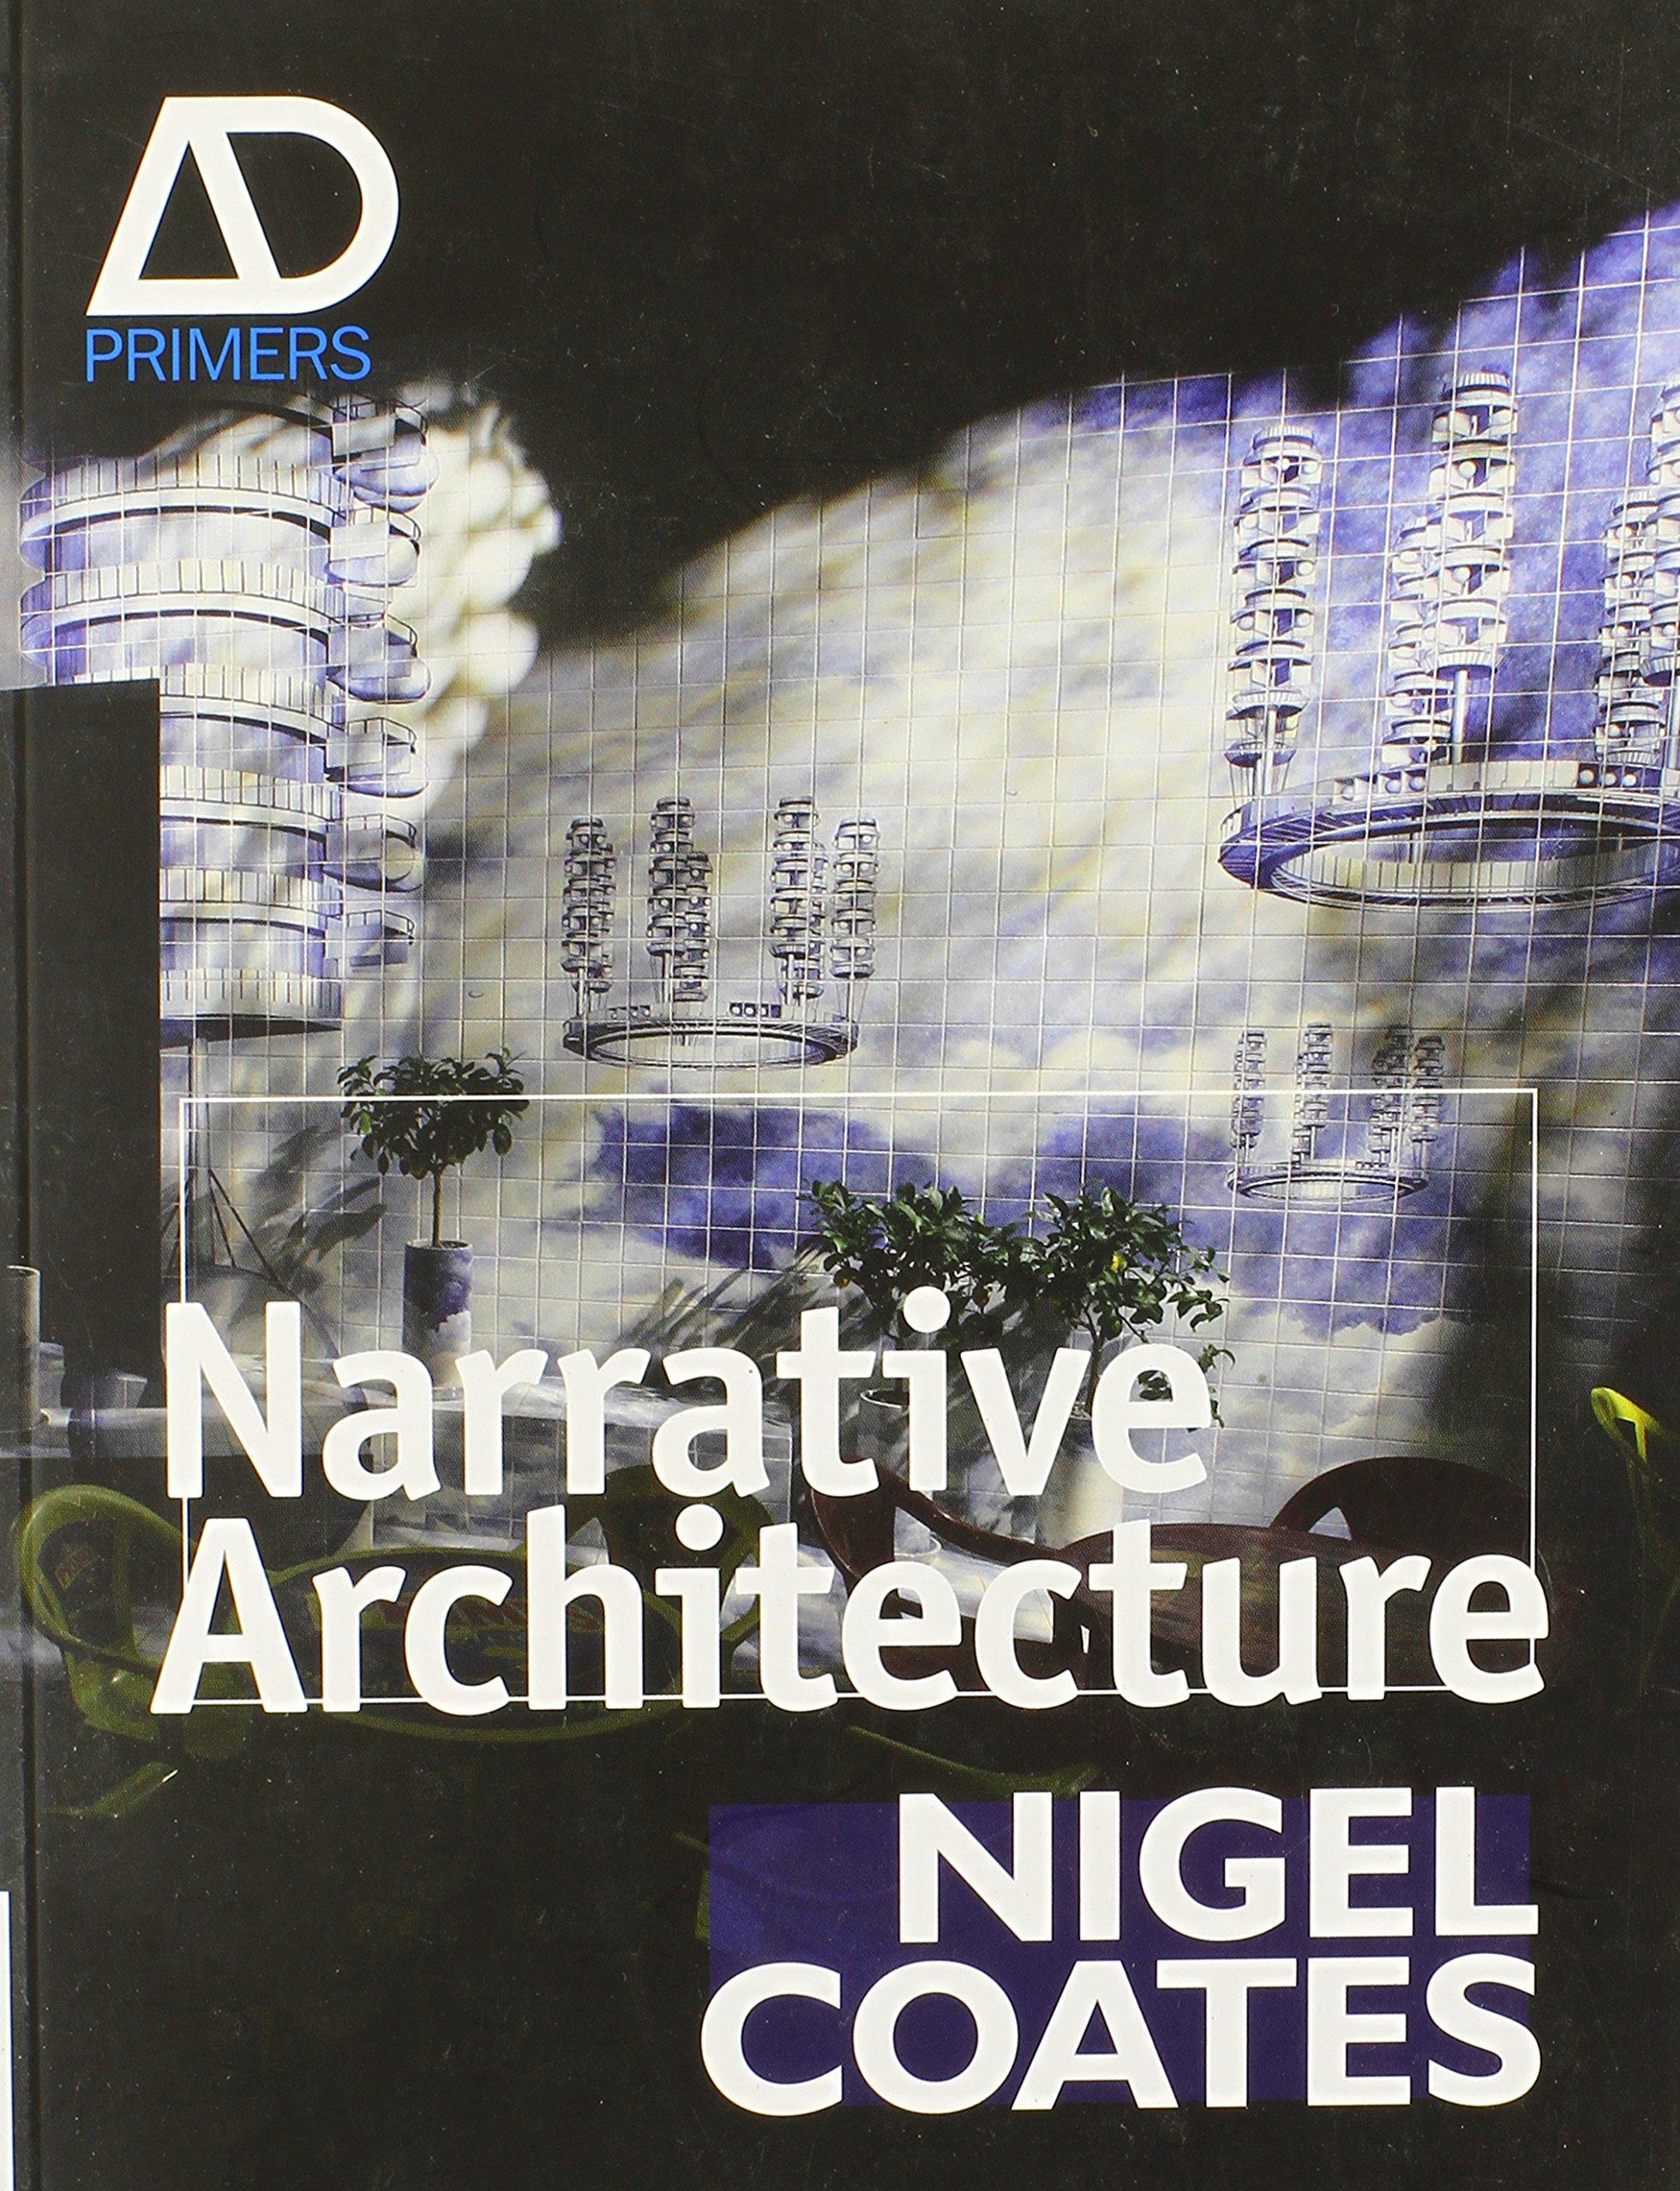 Nigel Coates Narrative Architecture, Wiley, Londra, 2012